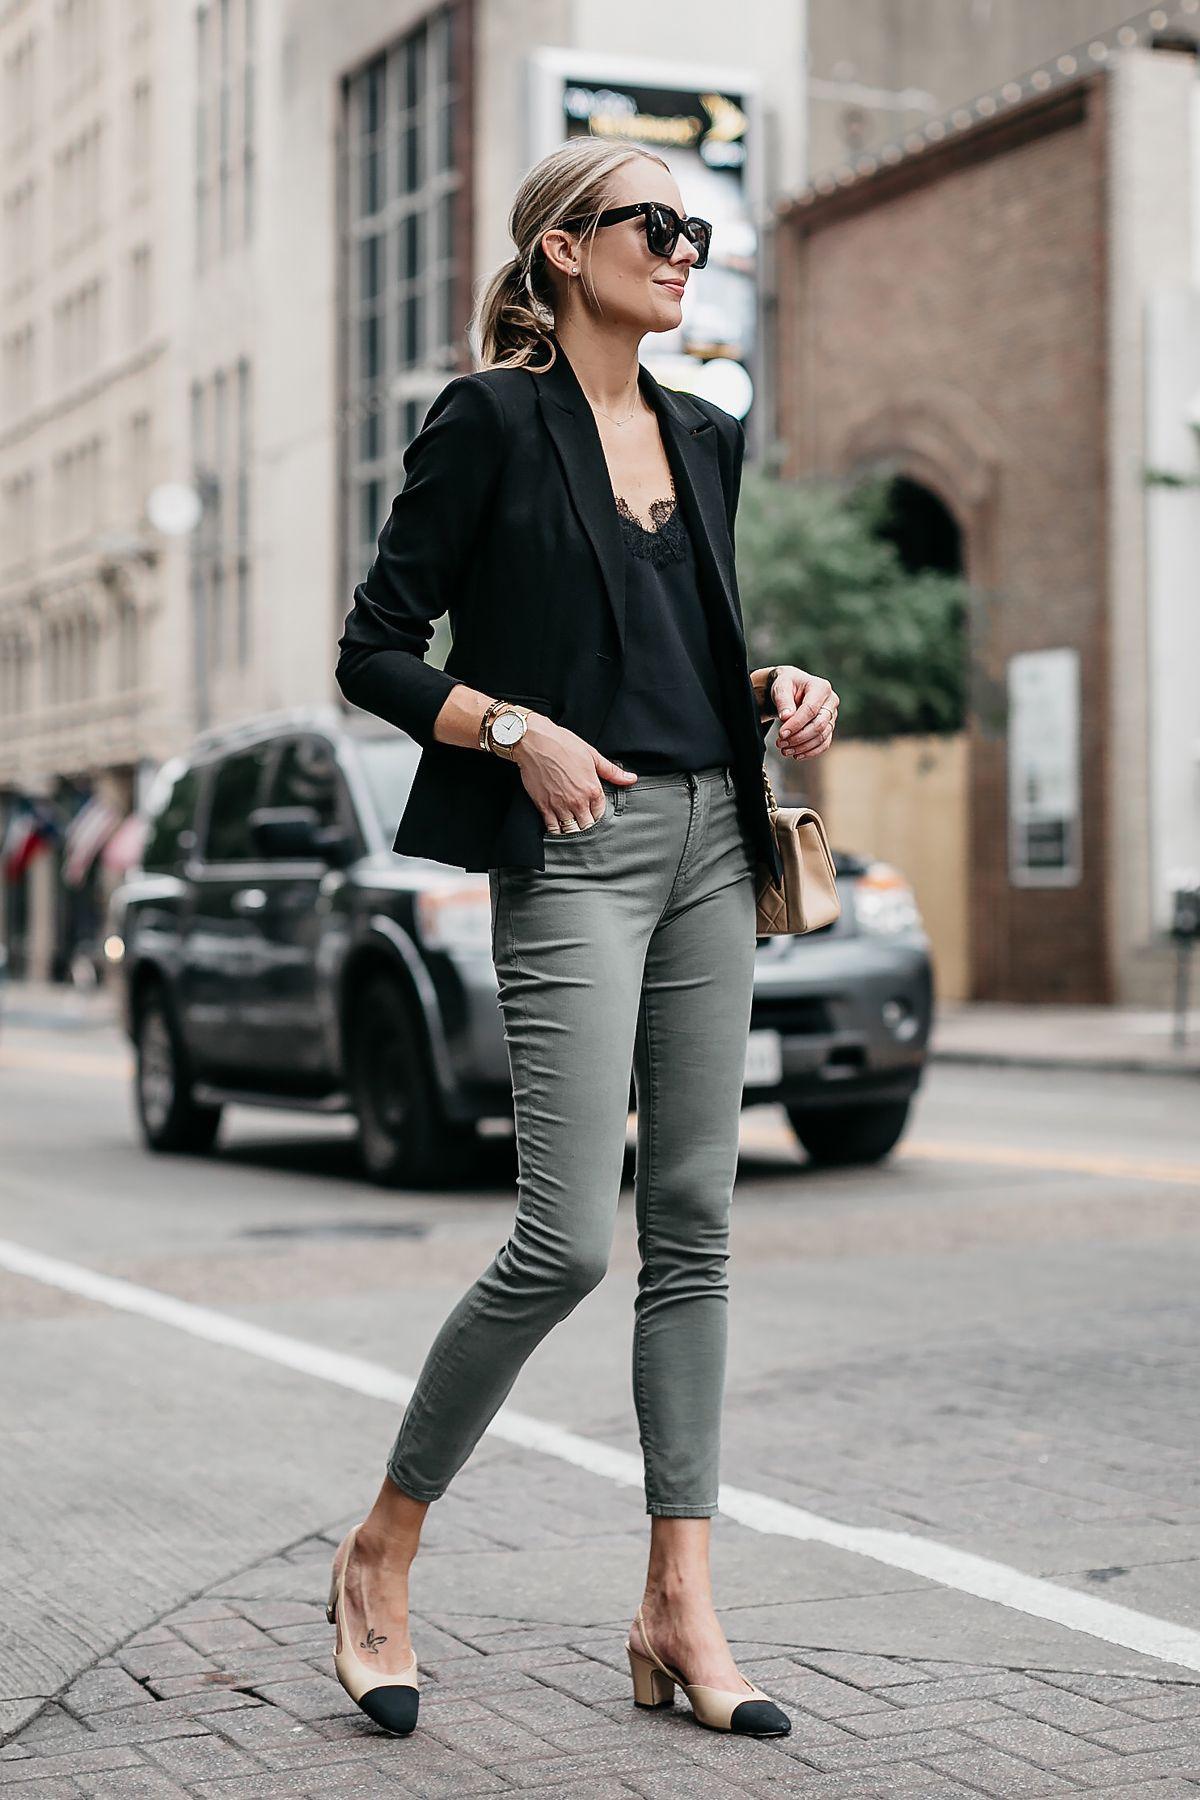 1160f32242 Fashion Jackson Black Lace Cami Black Blazer Frame Olive Green Jeans Chanel  Slingbacks Chanel Tan Handbag 2